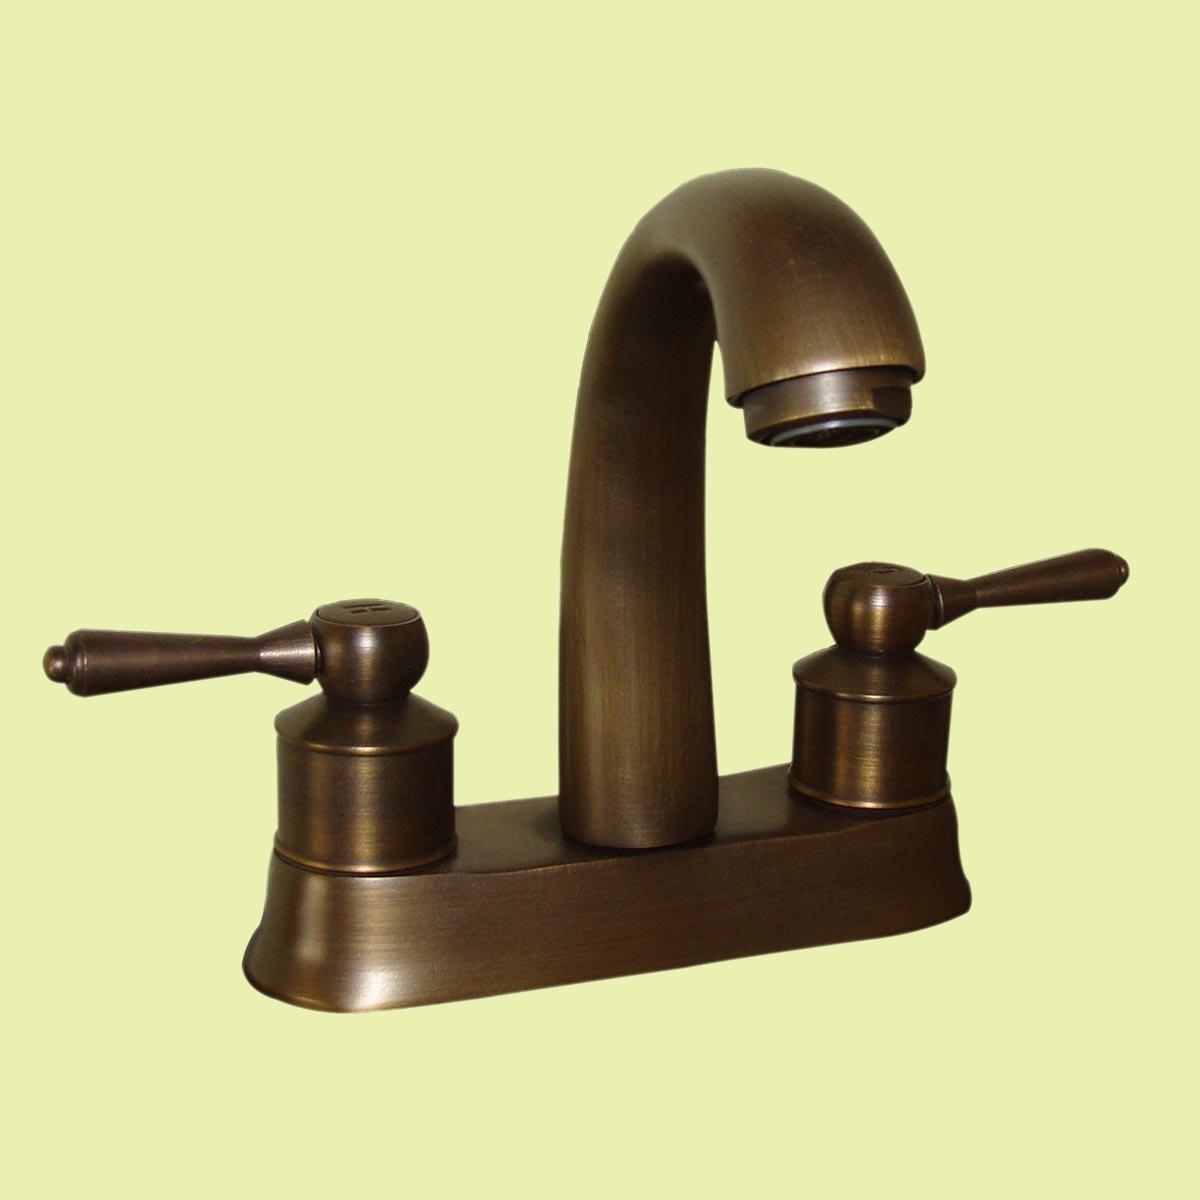 Vintage Bathroom Faucets Sale Contemporary Vessel Ceramic Valve Single Handle One On Sale